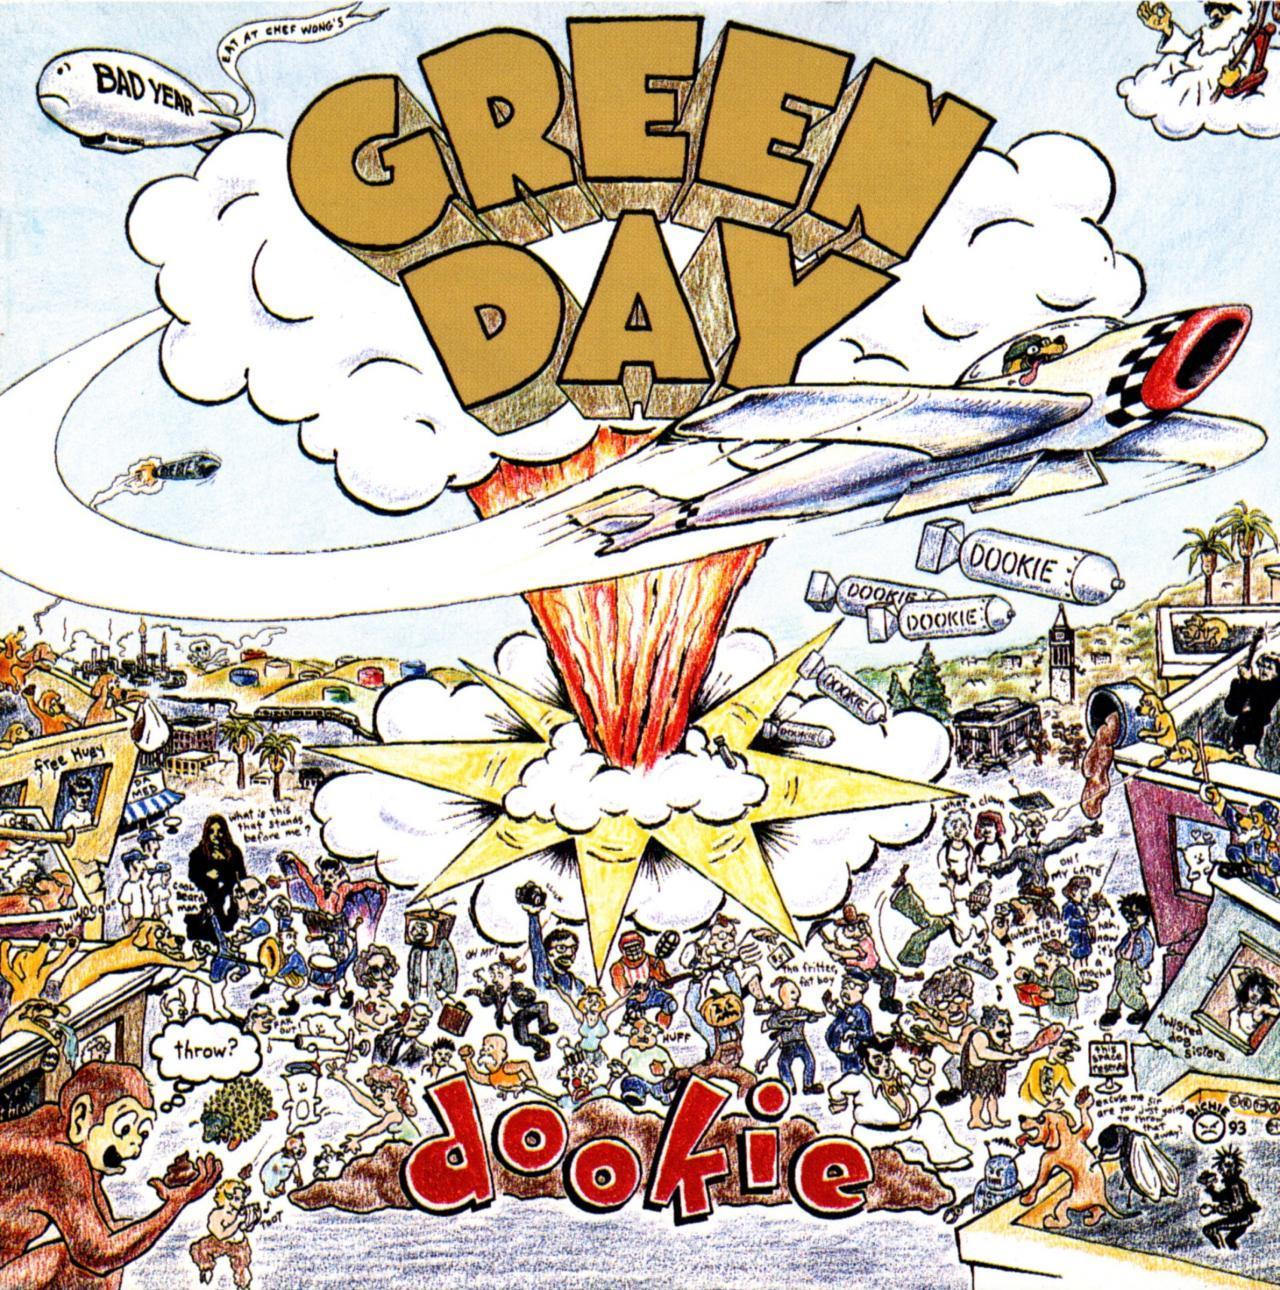 Green-Day-Dookie-large_convert_20170116010017.jpg